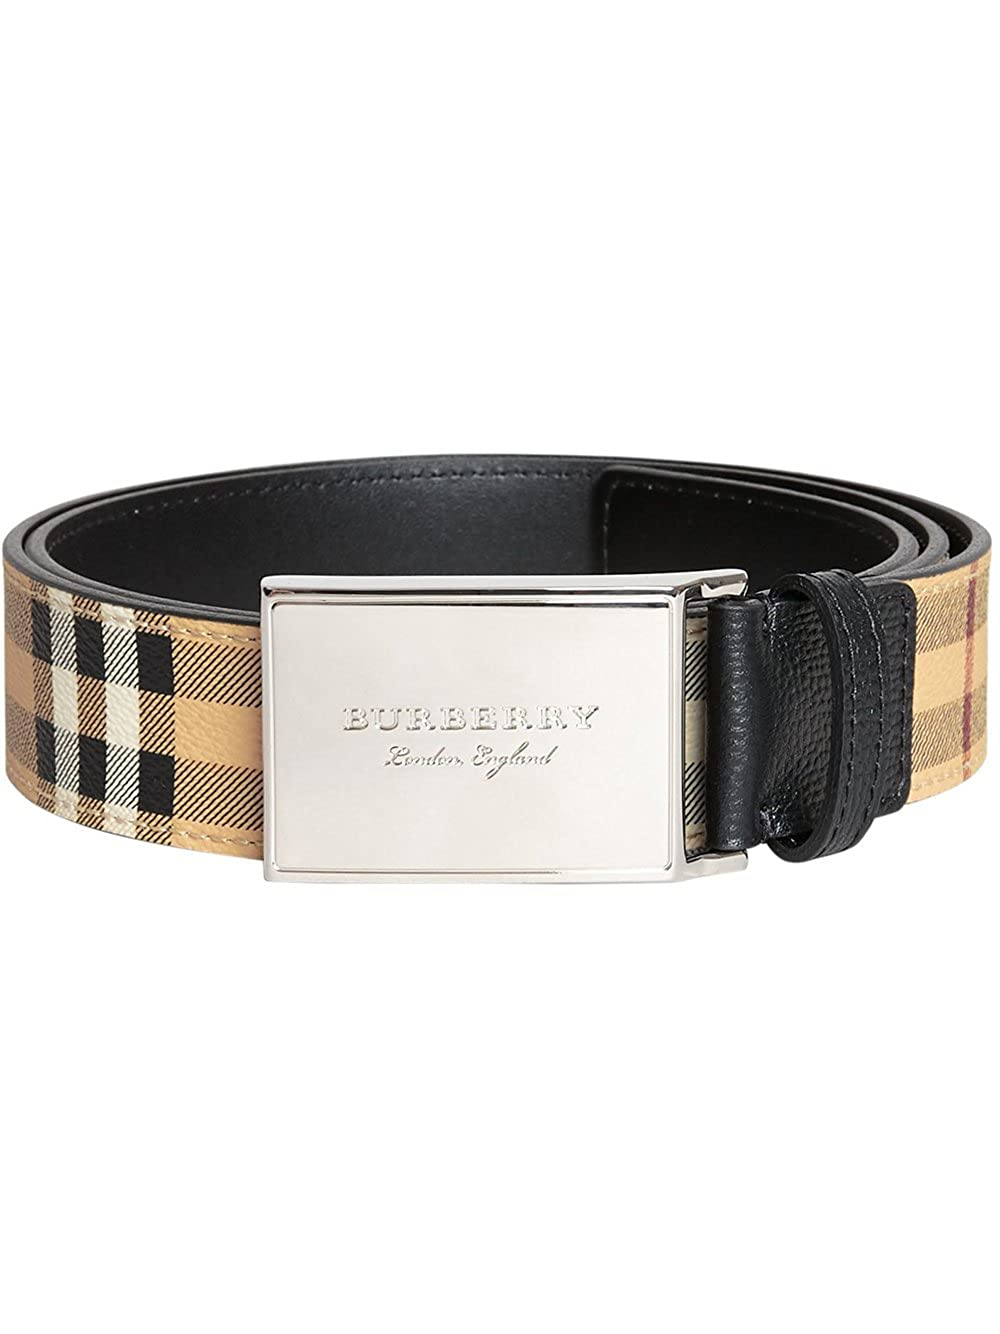 BURBERRY バーバリー Haymarke Check belt 4062509 ベルト【並行輸入品】 B07F36F5ZJ 100